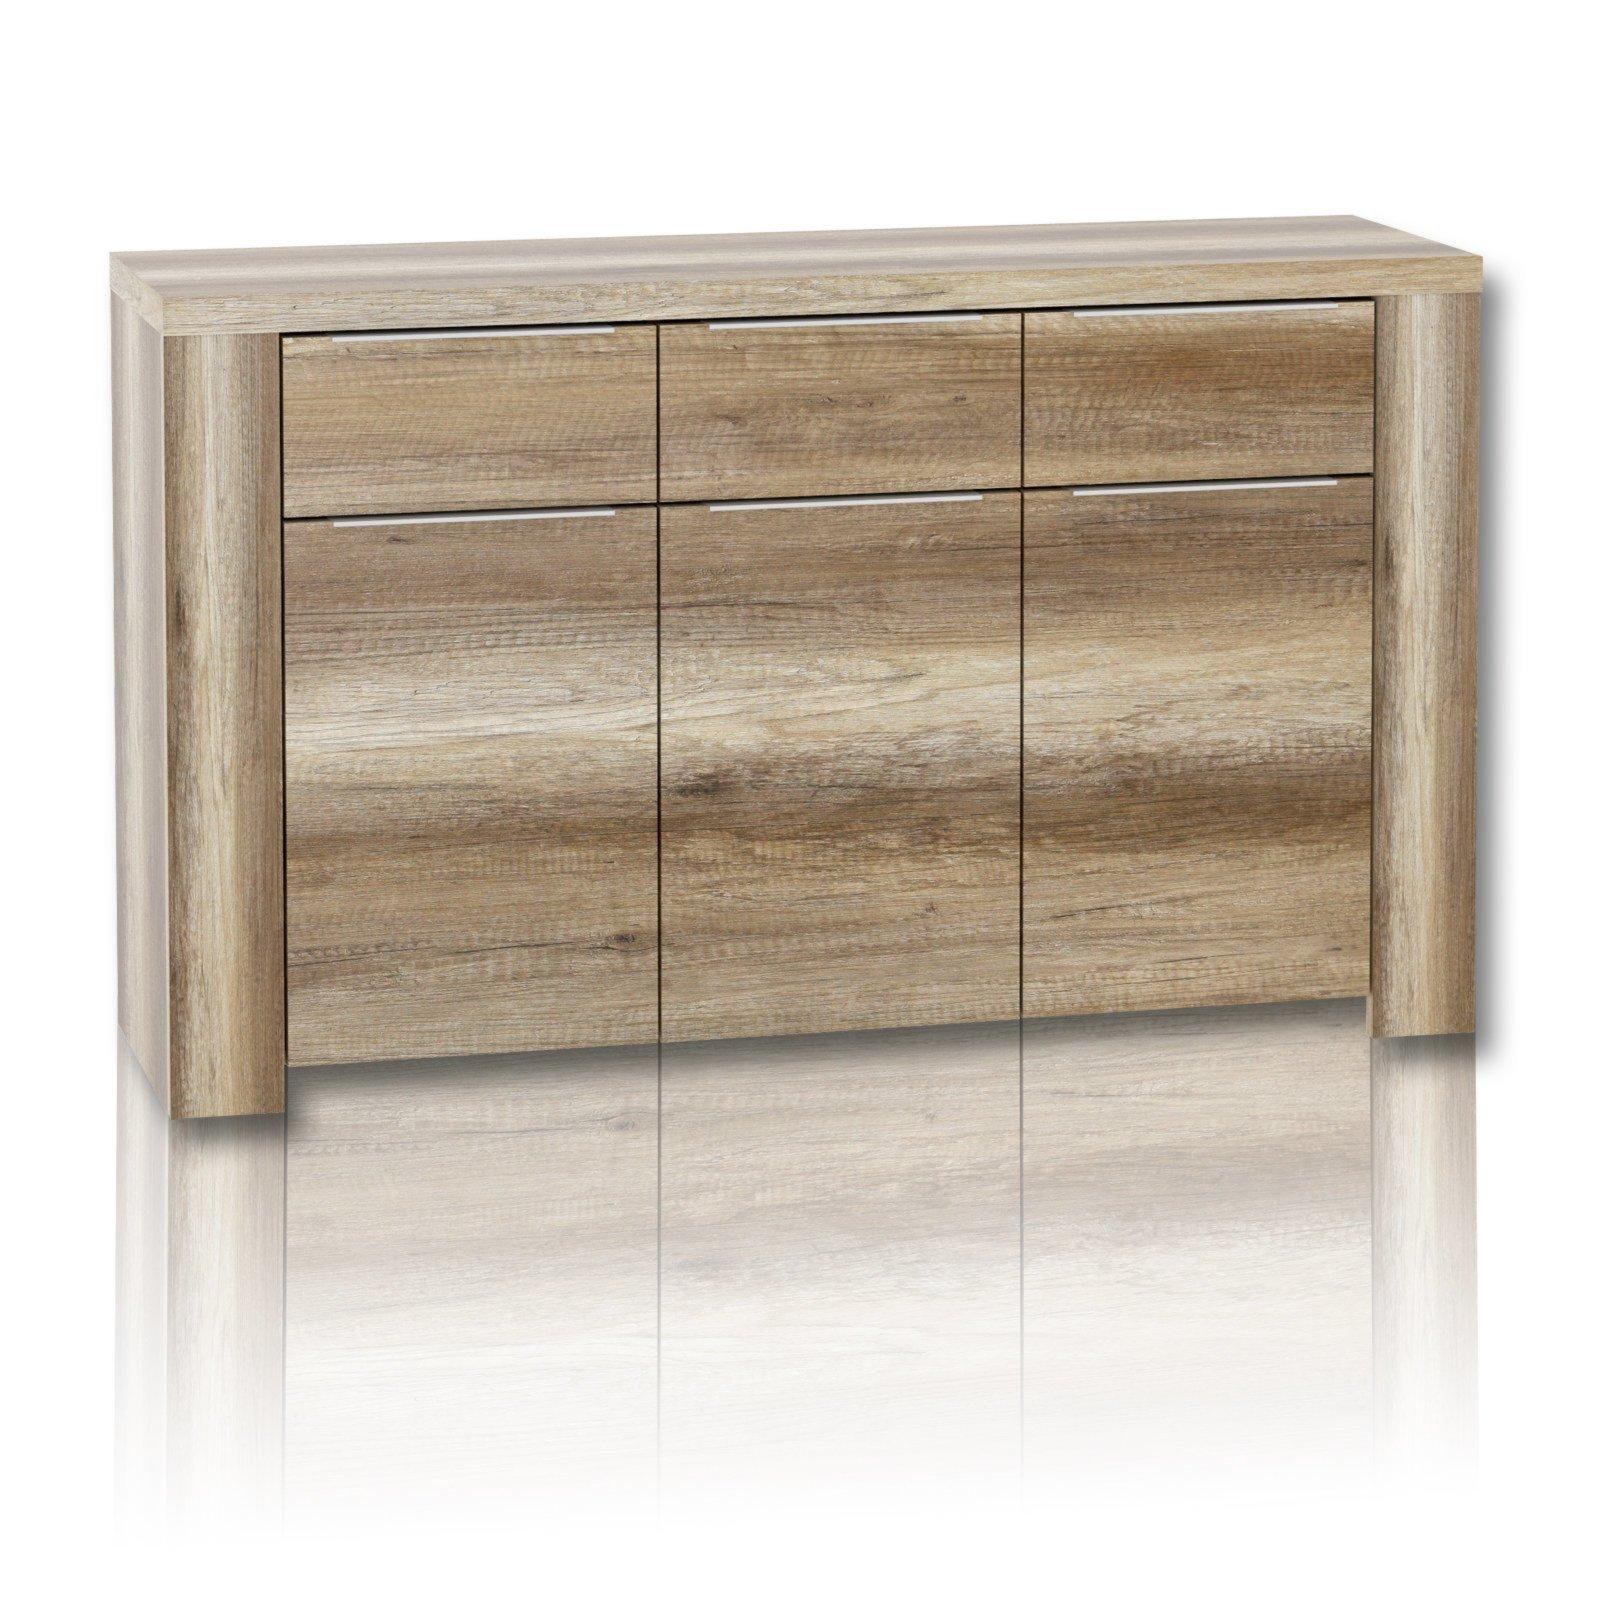 kommode calpe eiche antik 144 cm breite kommoden sideboards m bel roller m belhaus. Black Bedroom Furniture Sets. Home Design Ideas